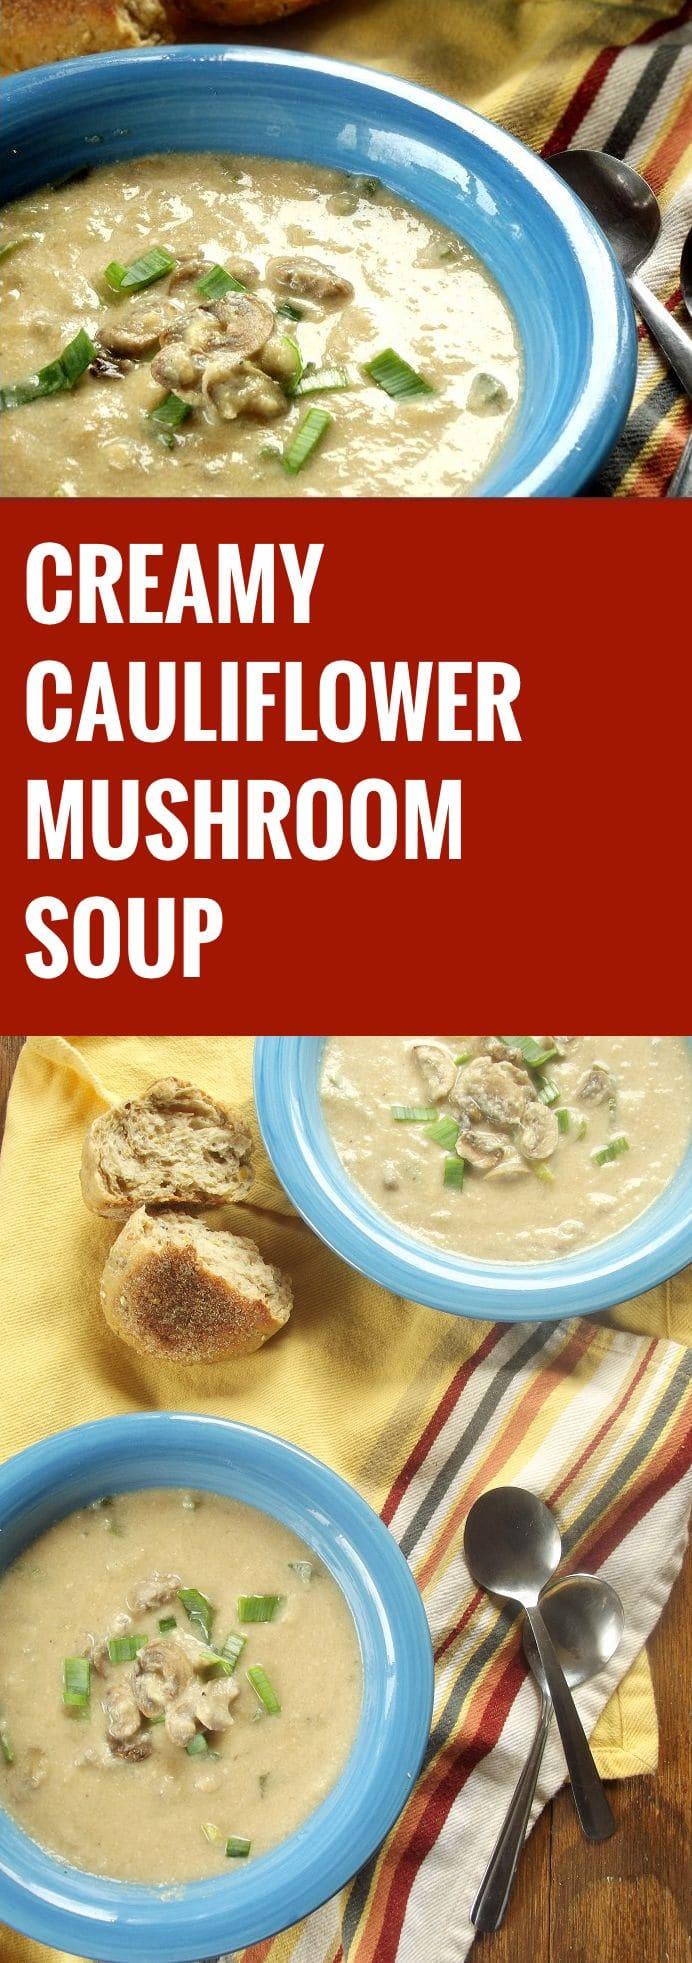 Creamy Cauliflower Mushroom Soup - Connoisseurus Veg